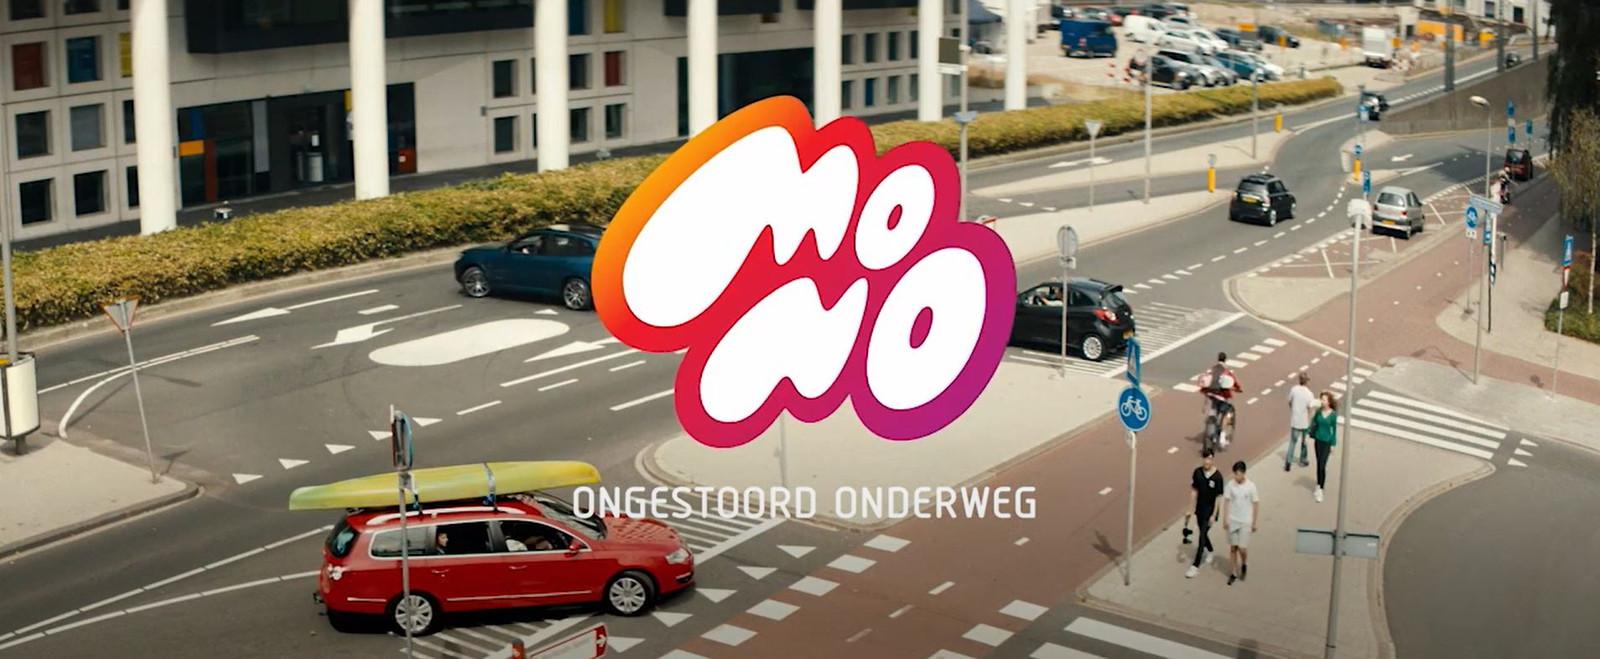 De MONO-campagne: 'Ongestoord onderweg'.